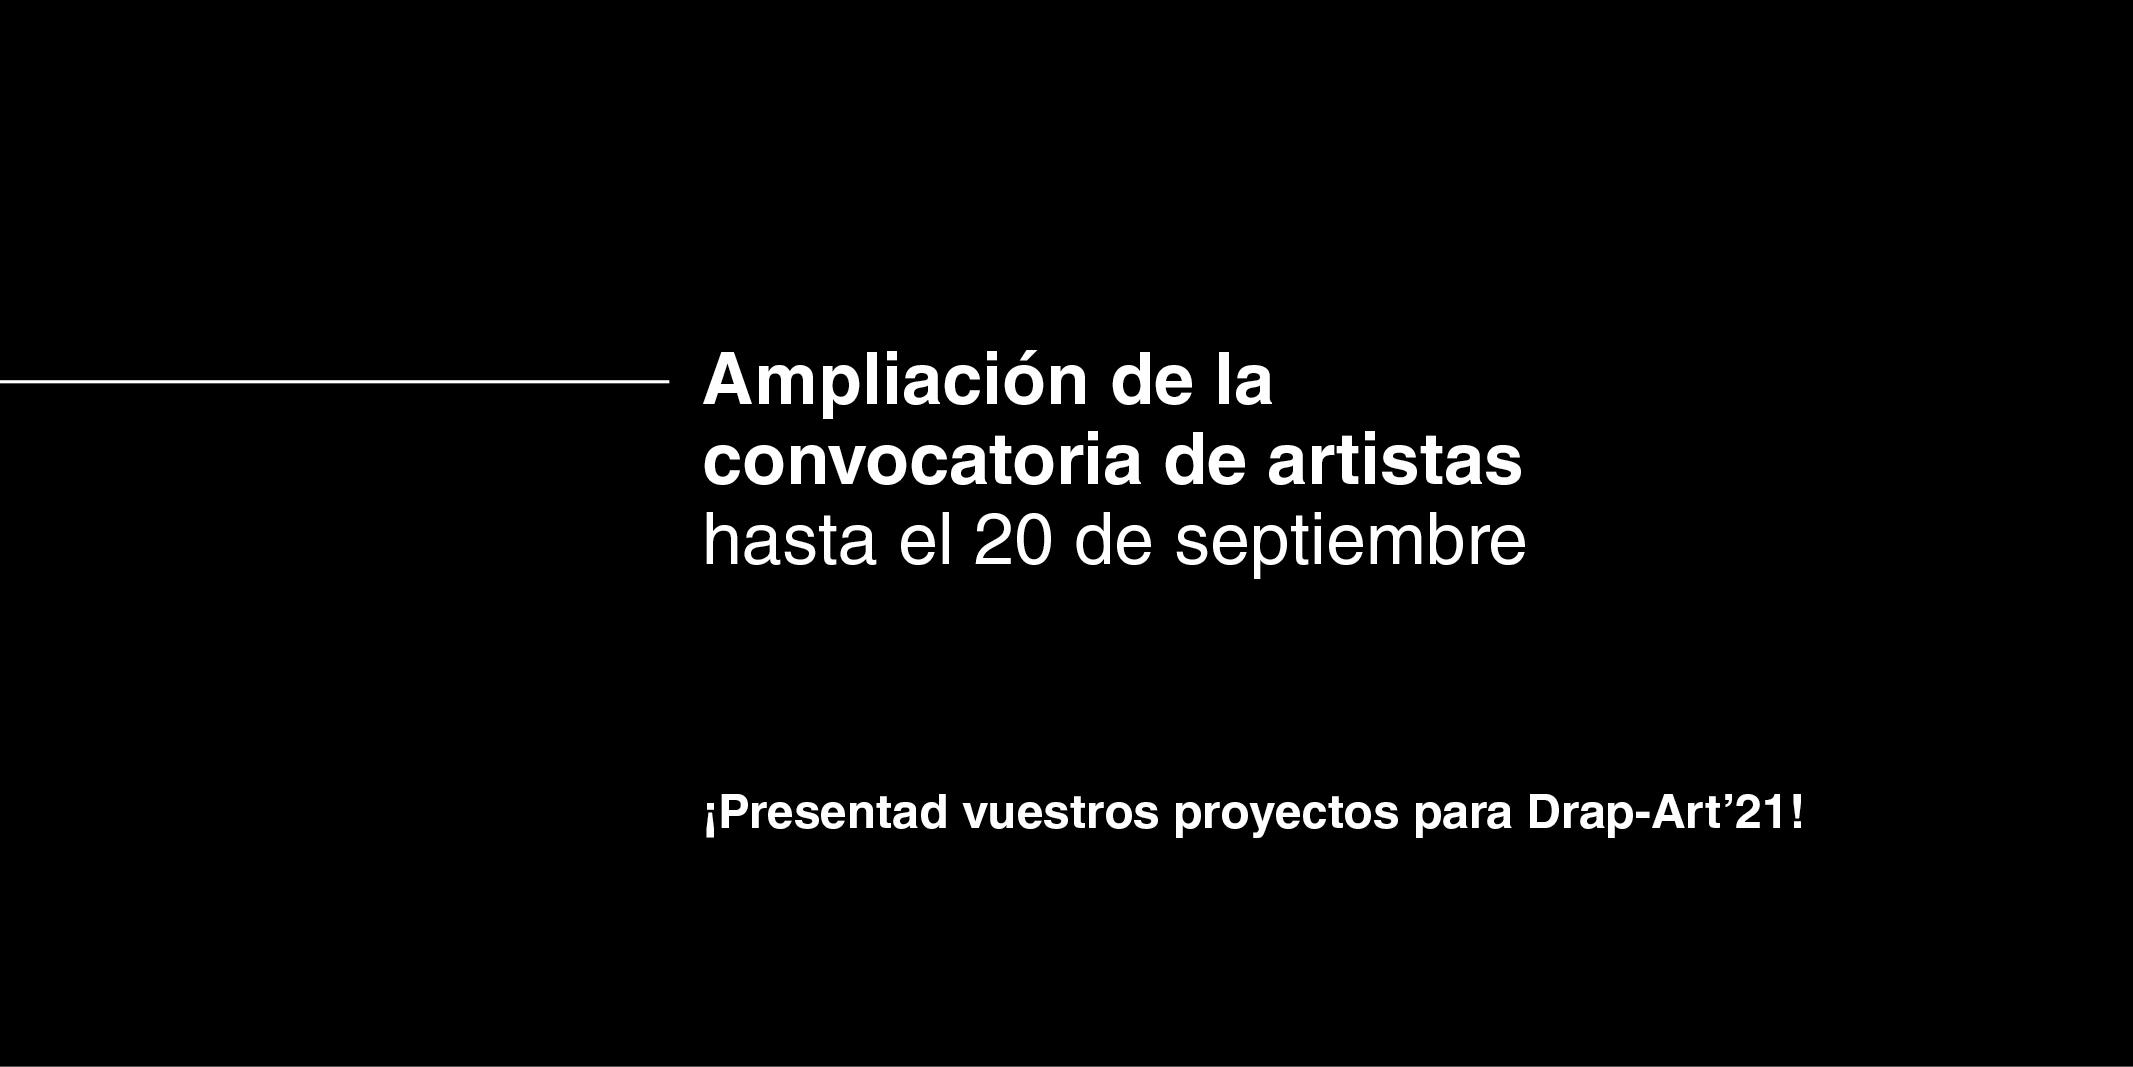 DrapArt'21 – Amplicacion Convocatoria